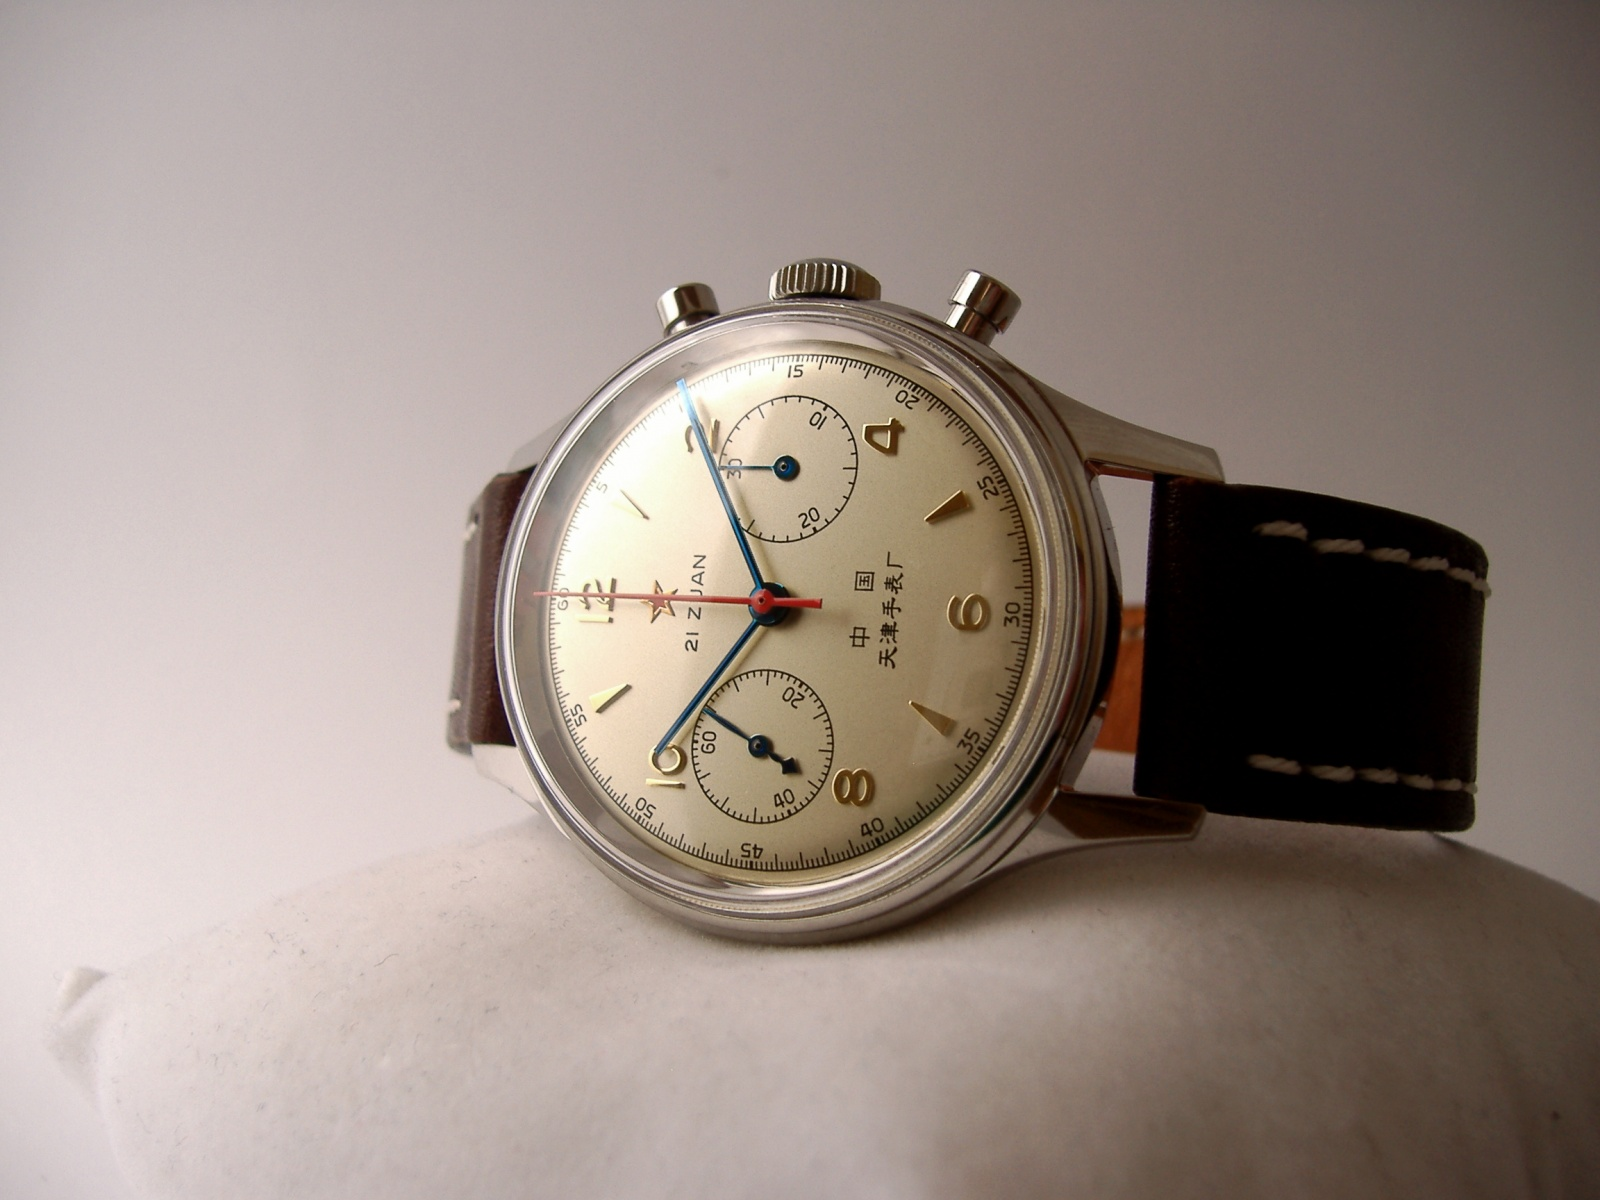 4. Seagull 1963